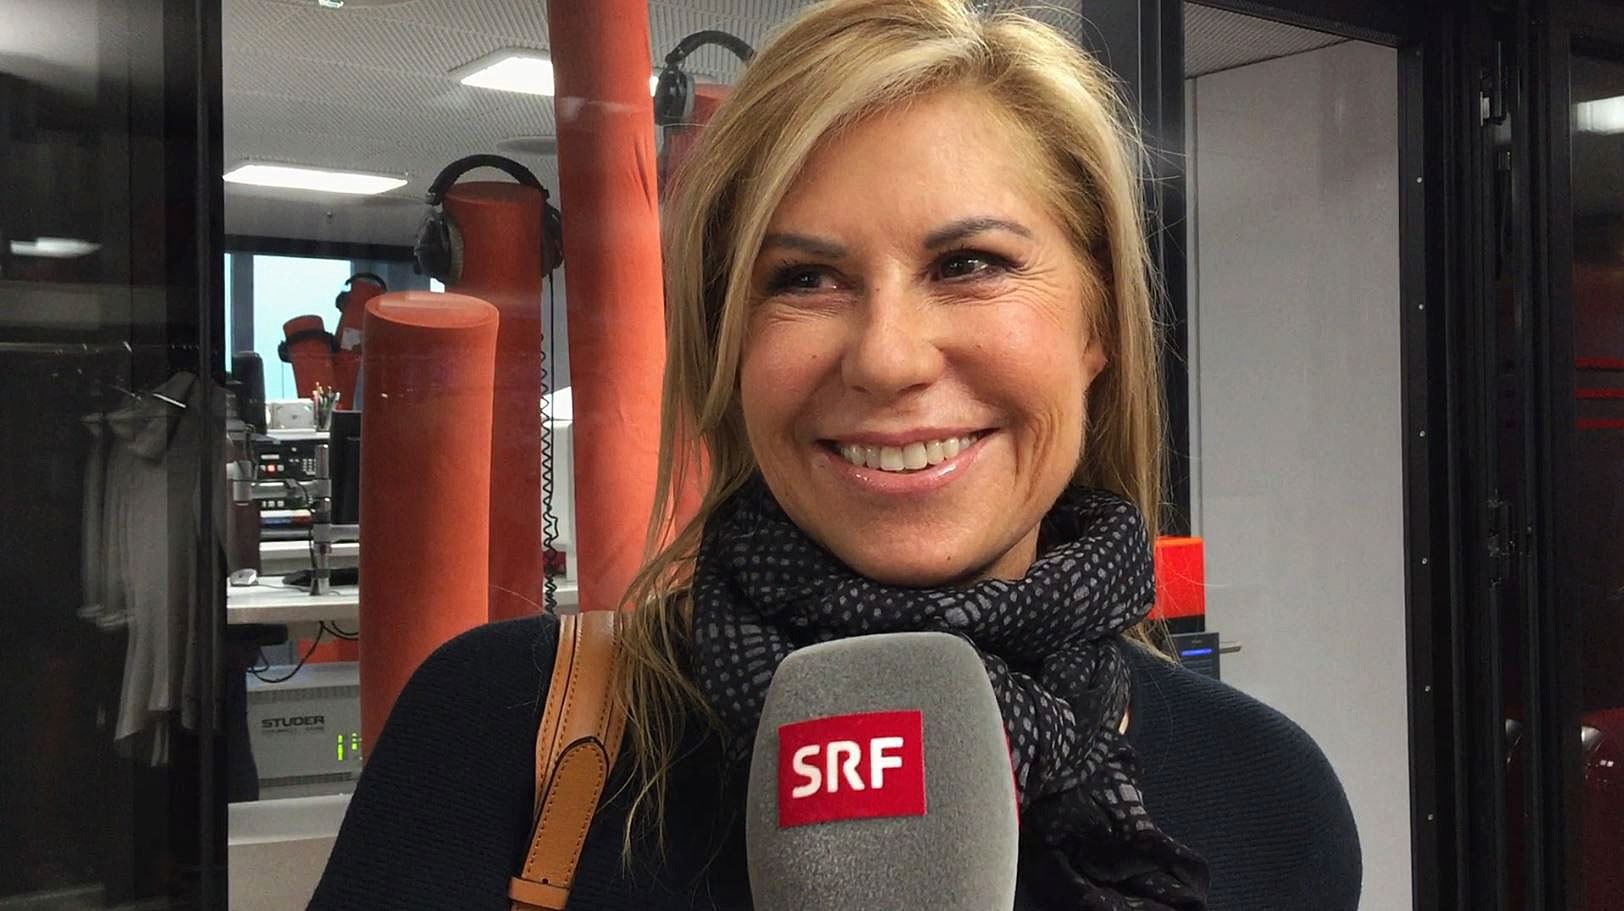 Denise Biellmann: Sport als Lebensschule